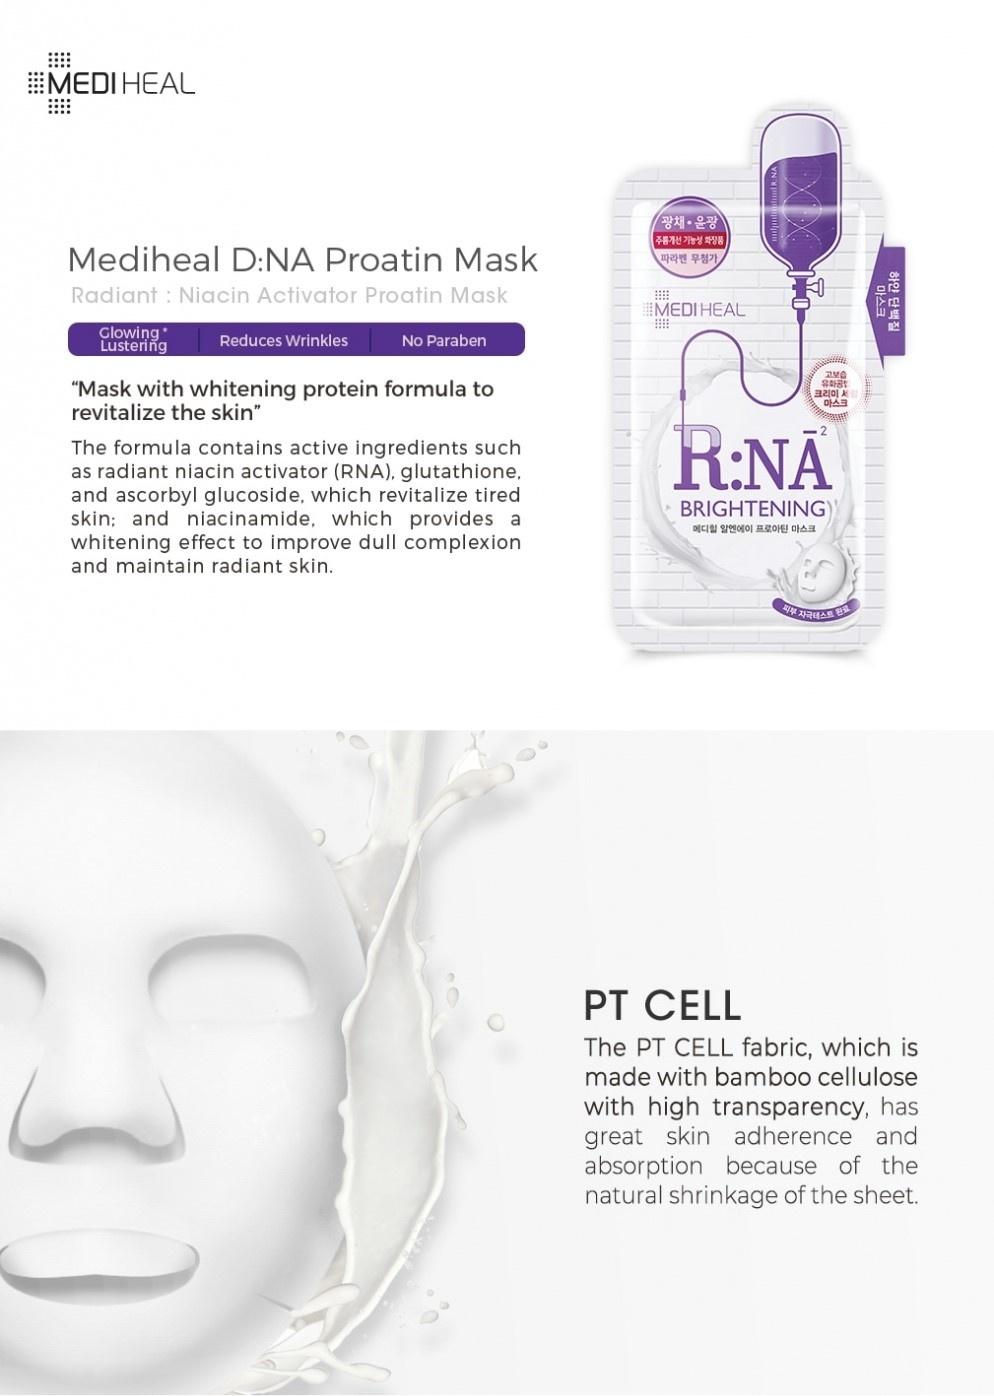 Proatin Mask R.NA Brightening-3